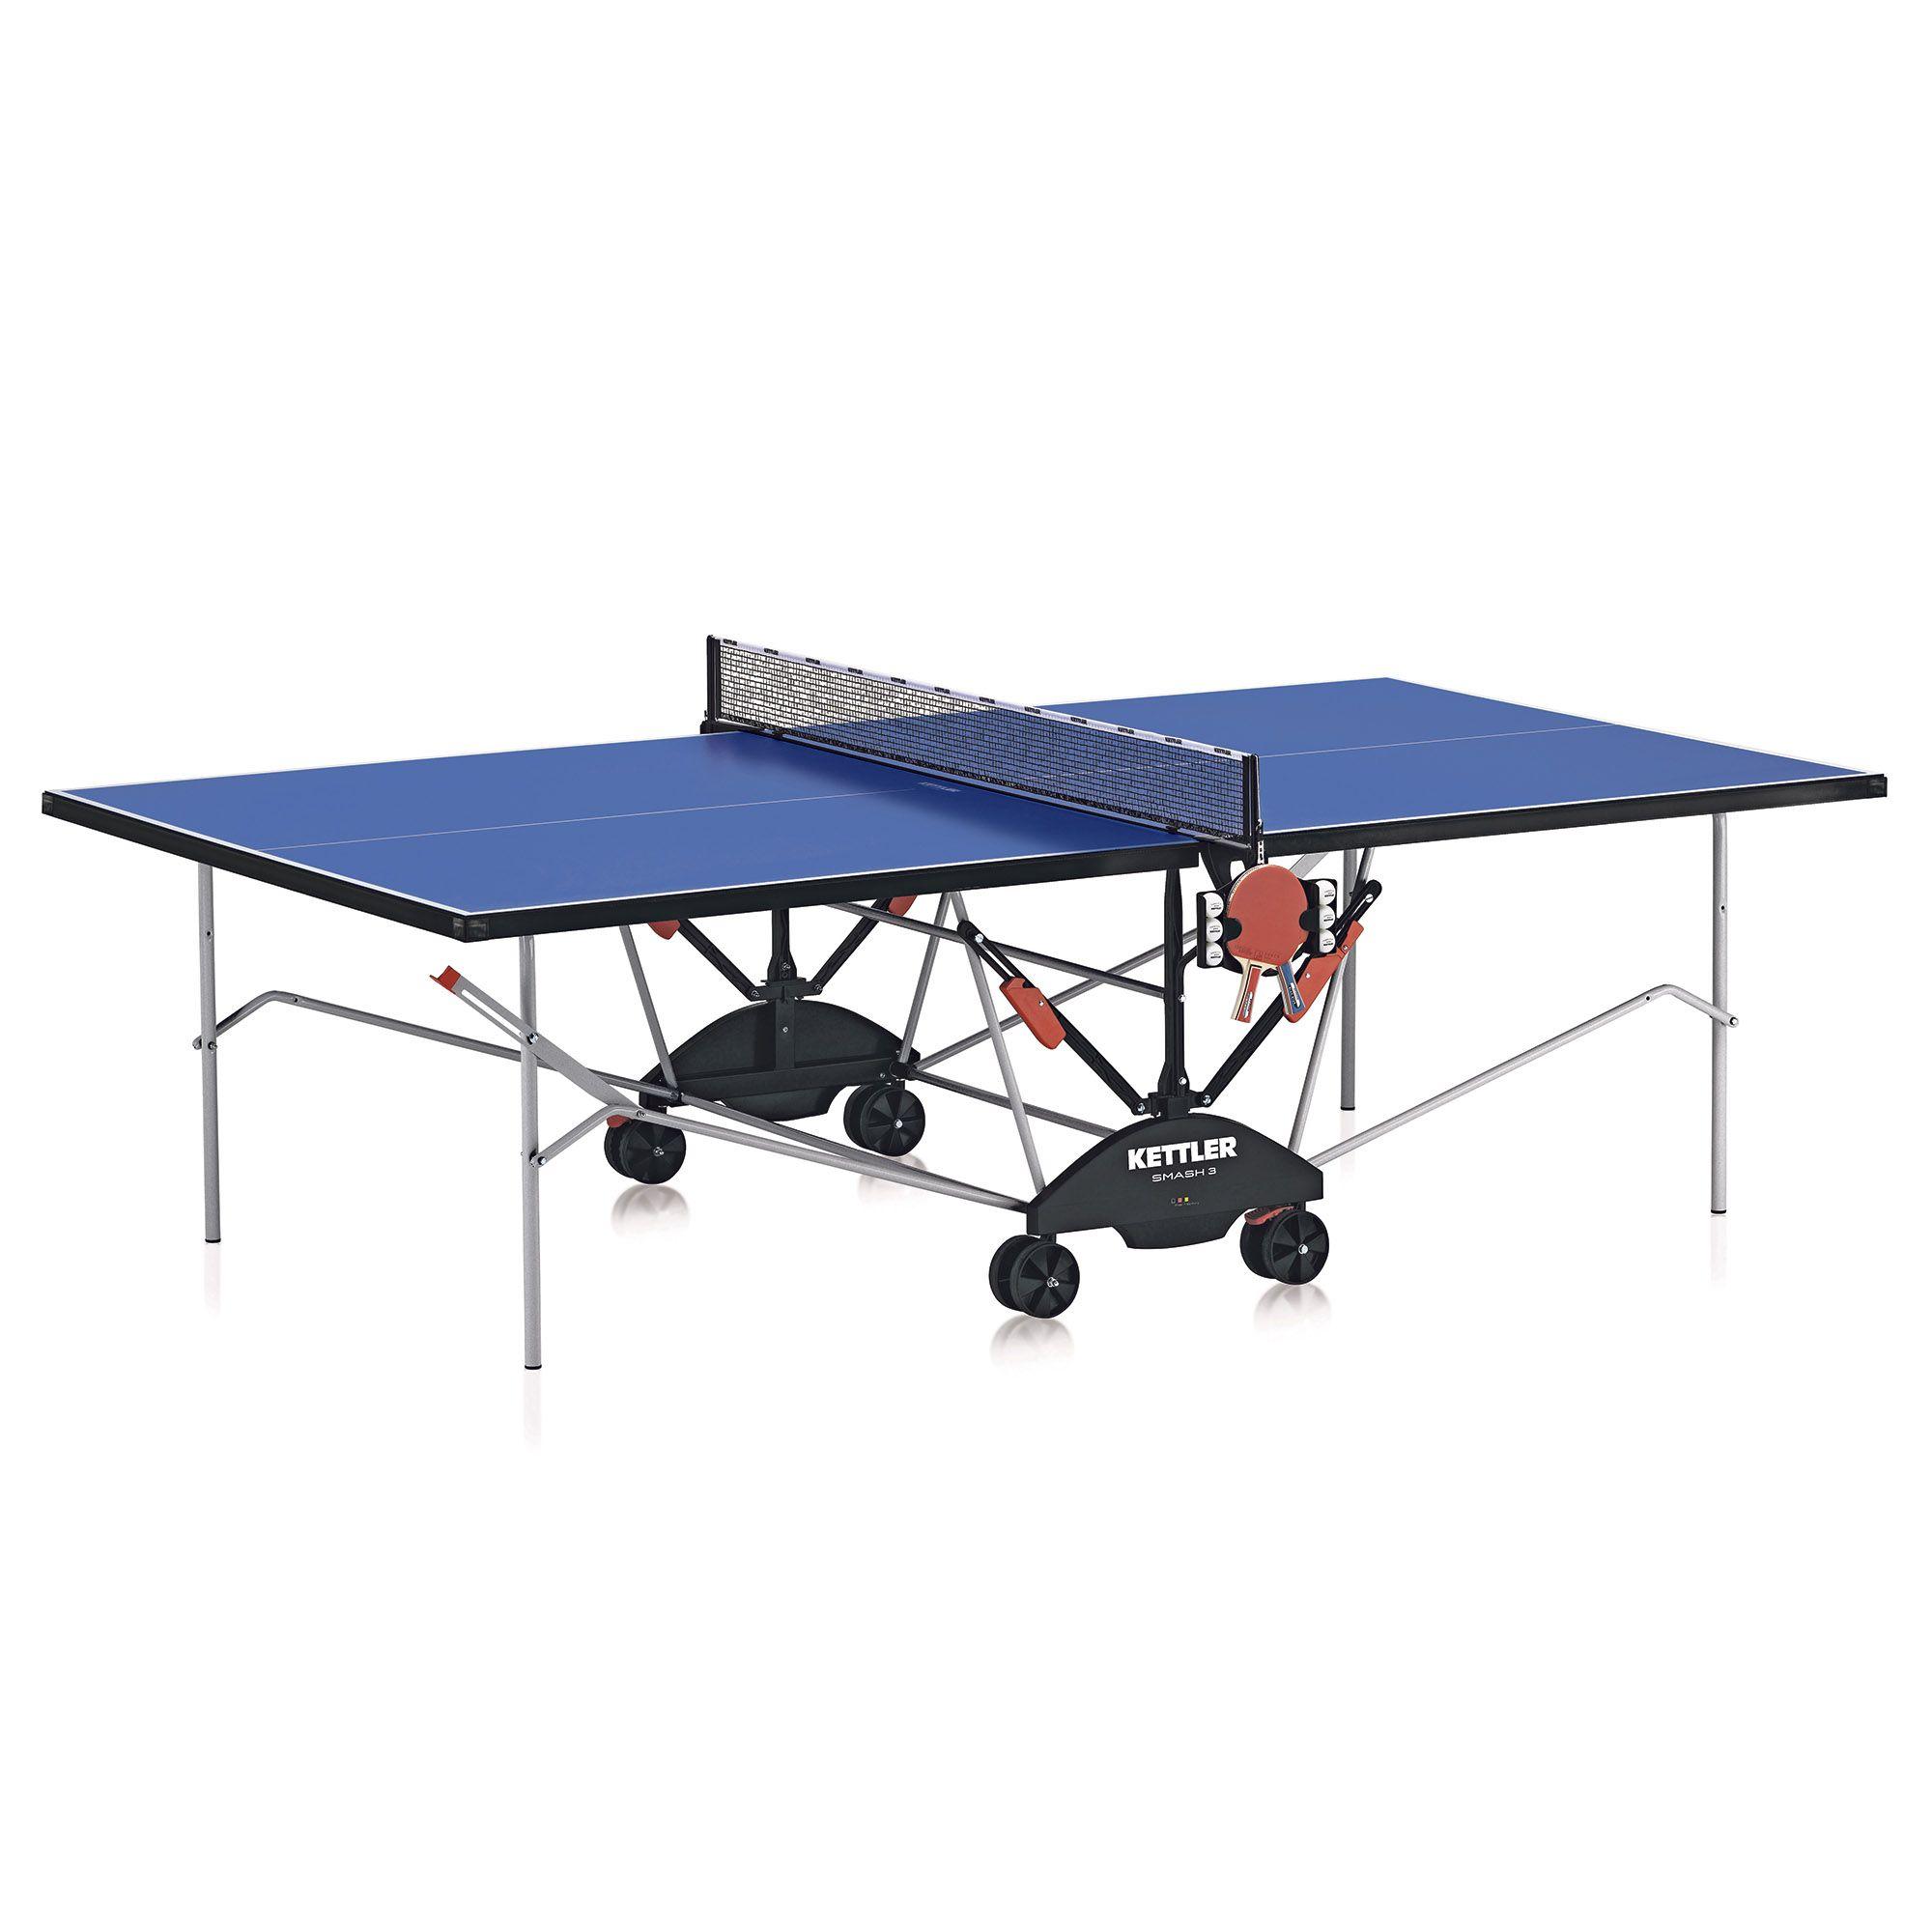 Kettler Smash 3 0 Outdoor Table Tennis Table Sweatband Com